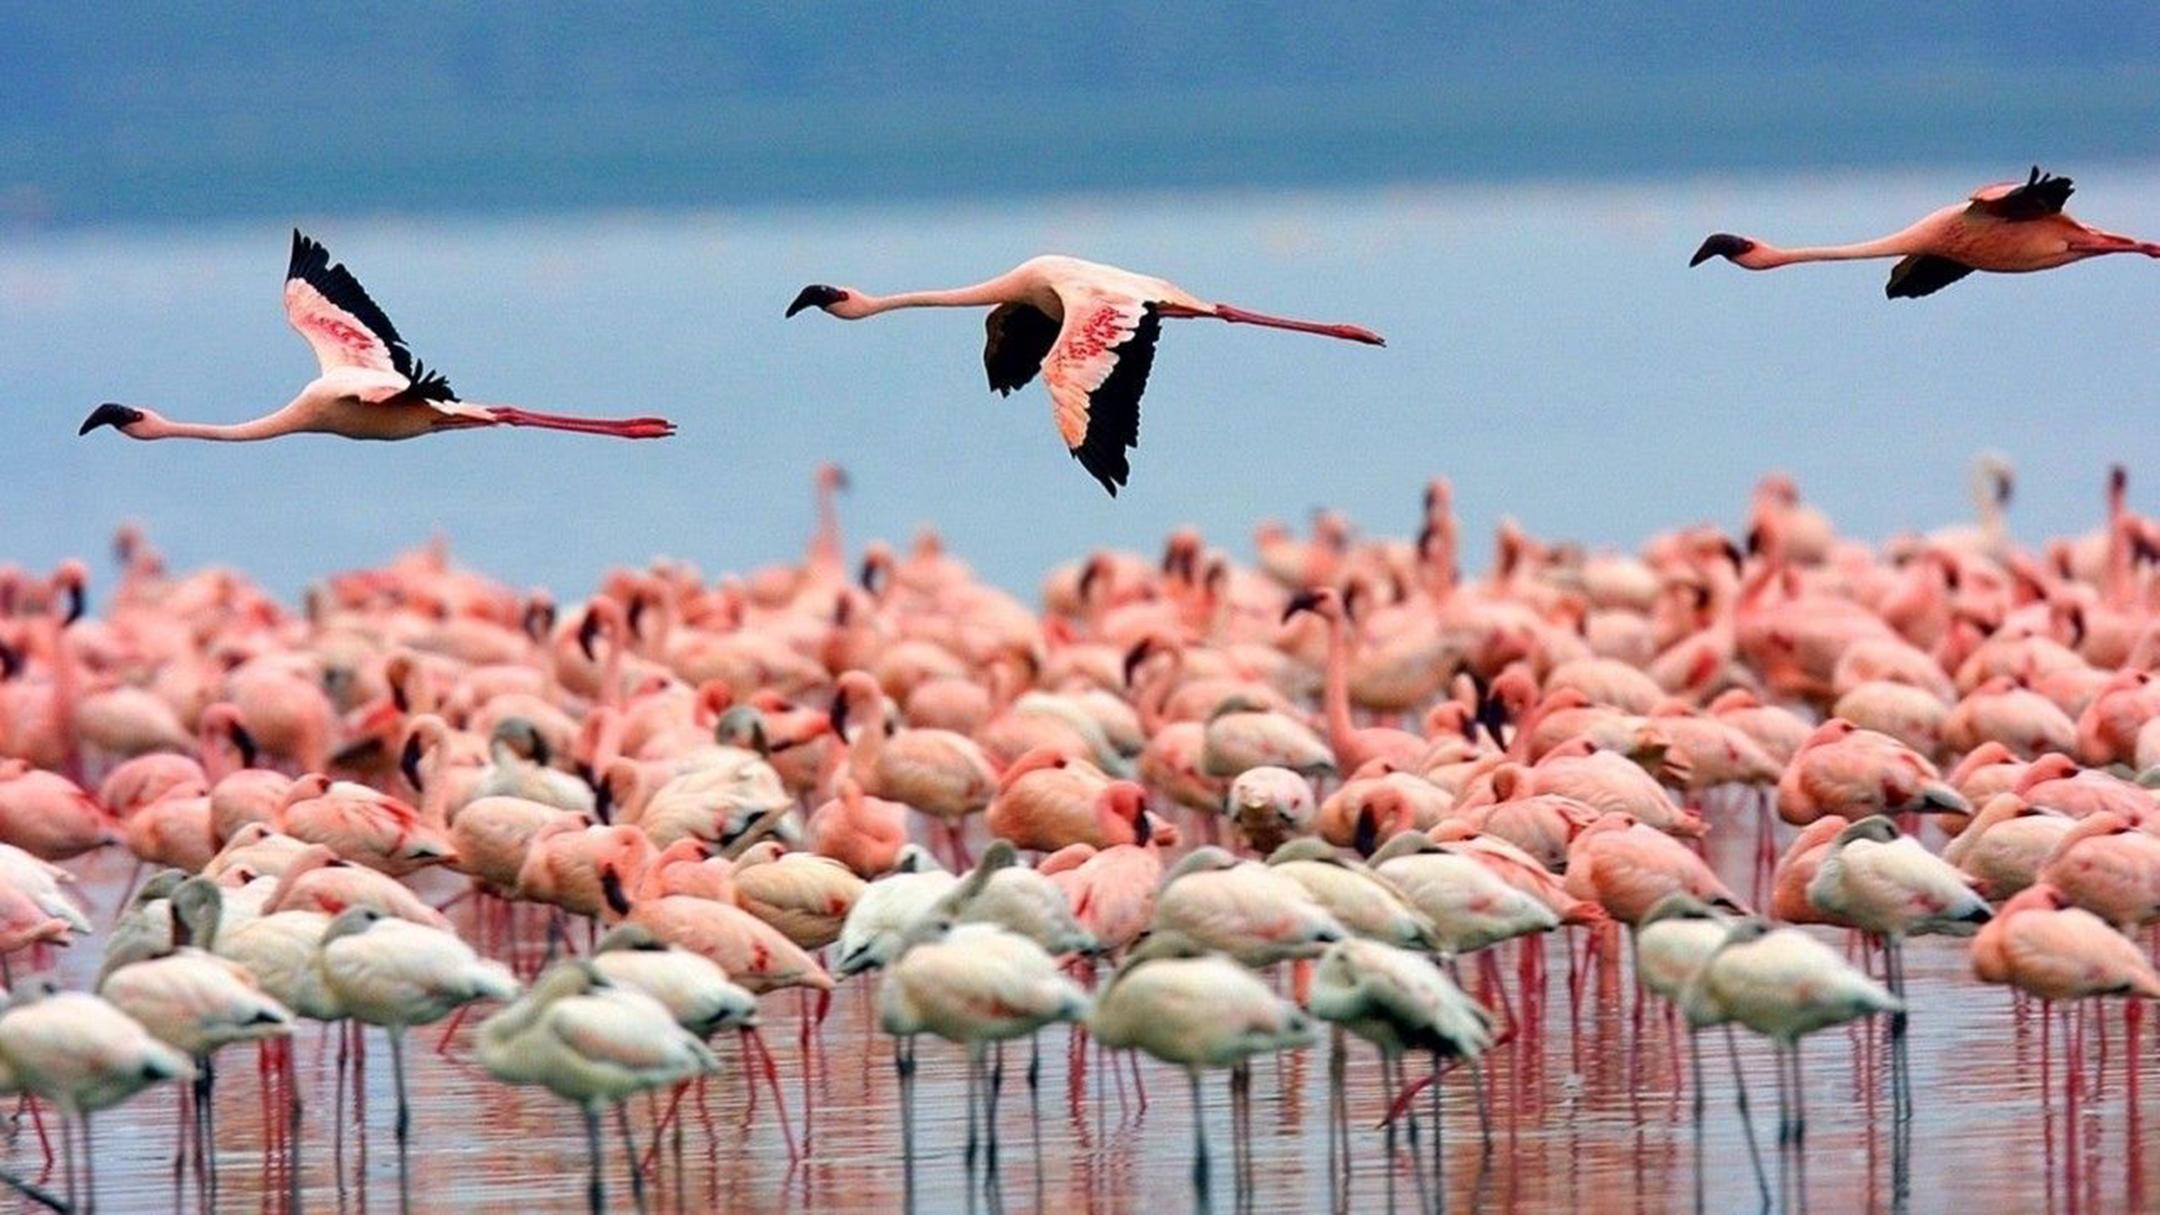 Photograph of the week: Flamingos at Olbia, Sardinia